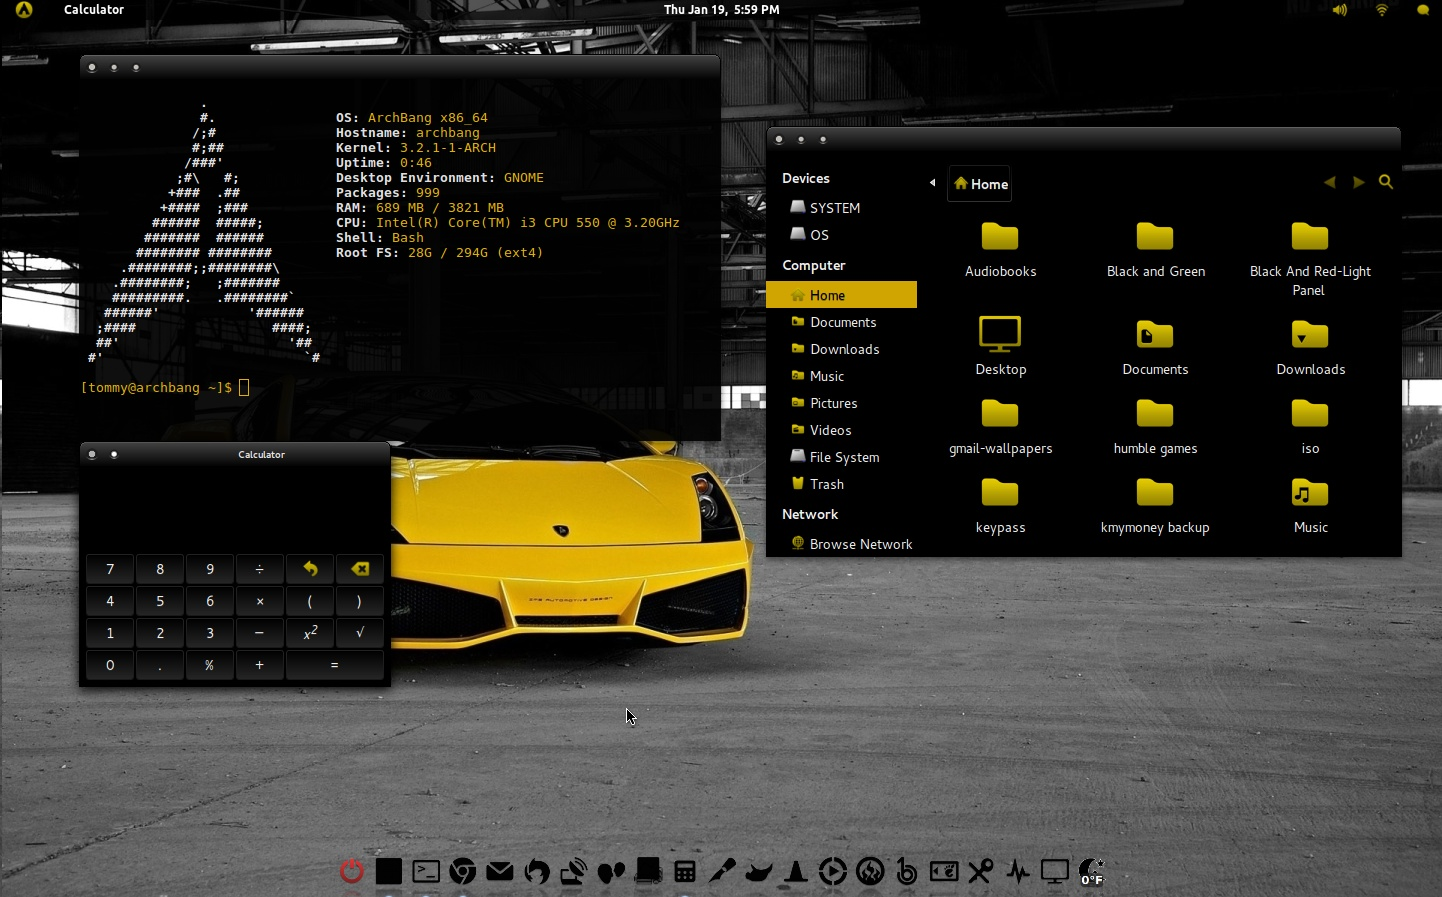 yellow-and-black-attack-gtk-theme_2_86785.jpg